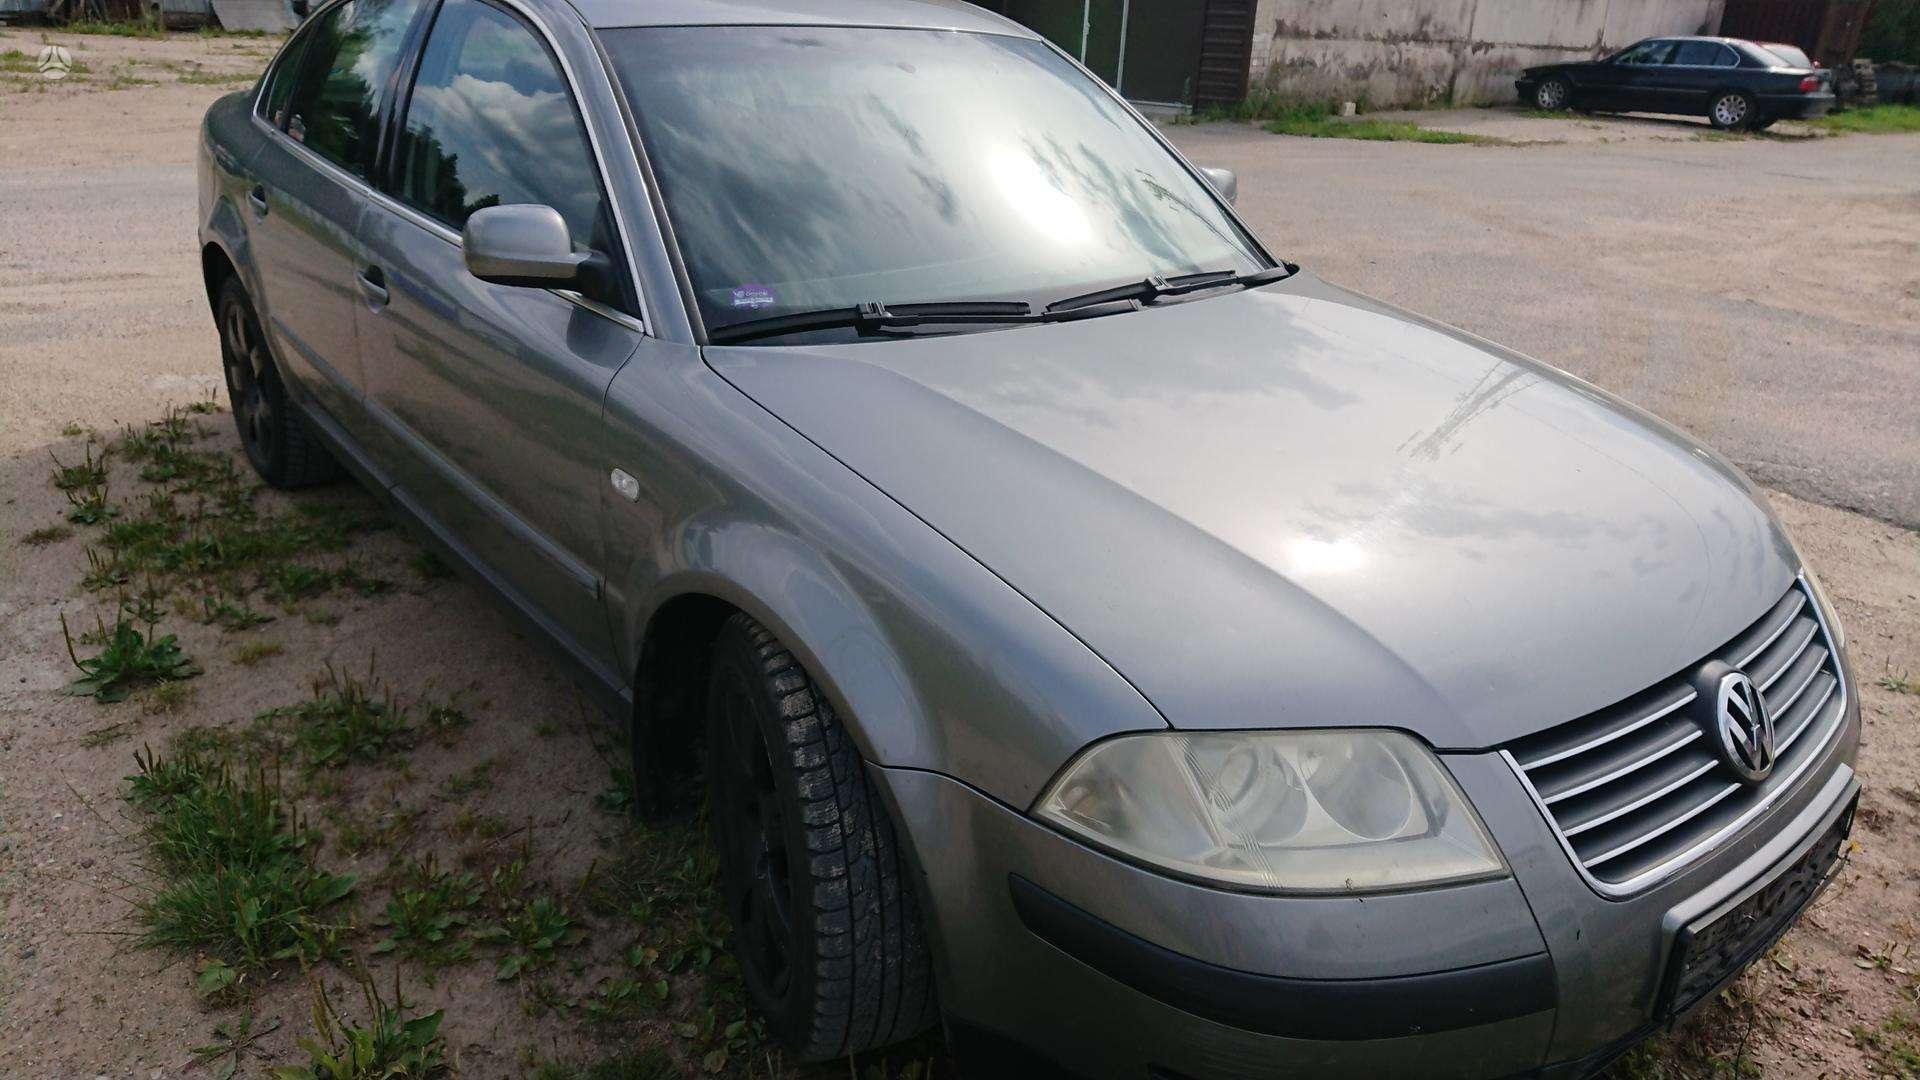 volkswagen-passat-dalimis-vw-passat-2001-2006m-1-9tdi-74kw-96